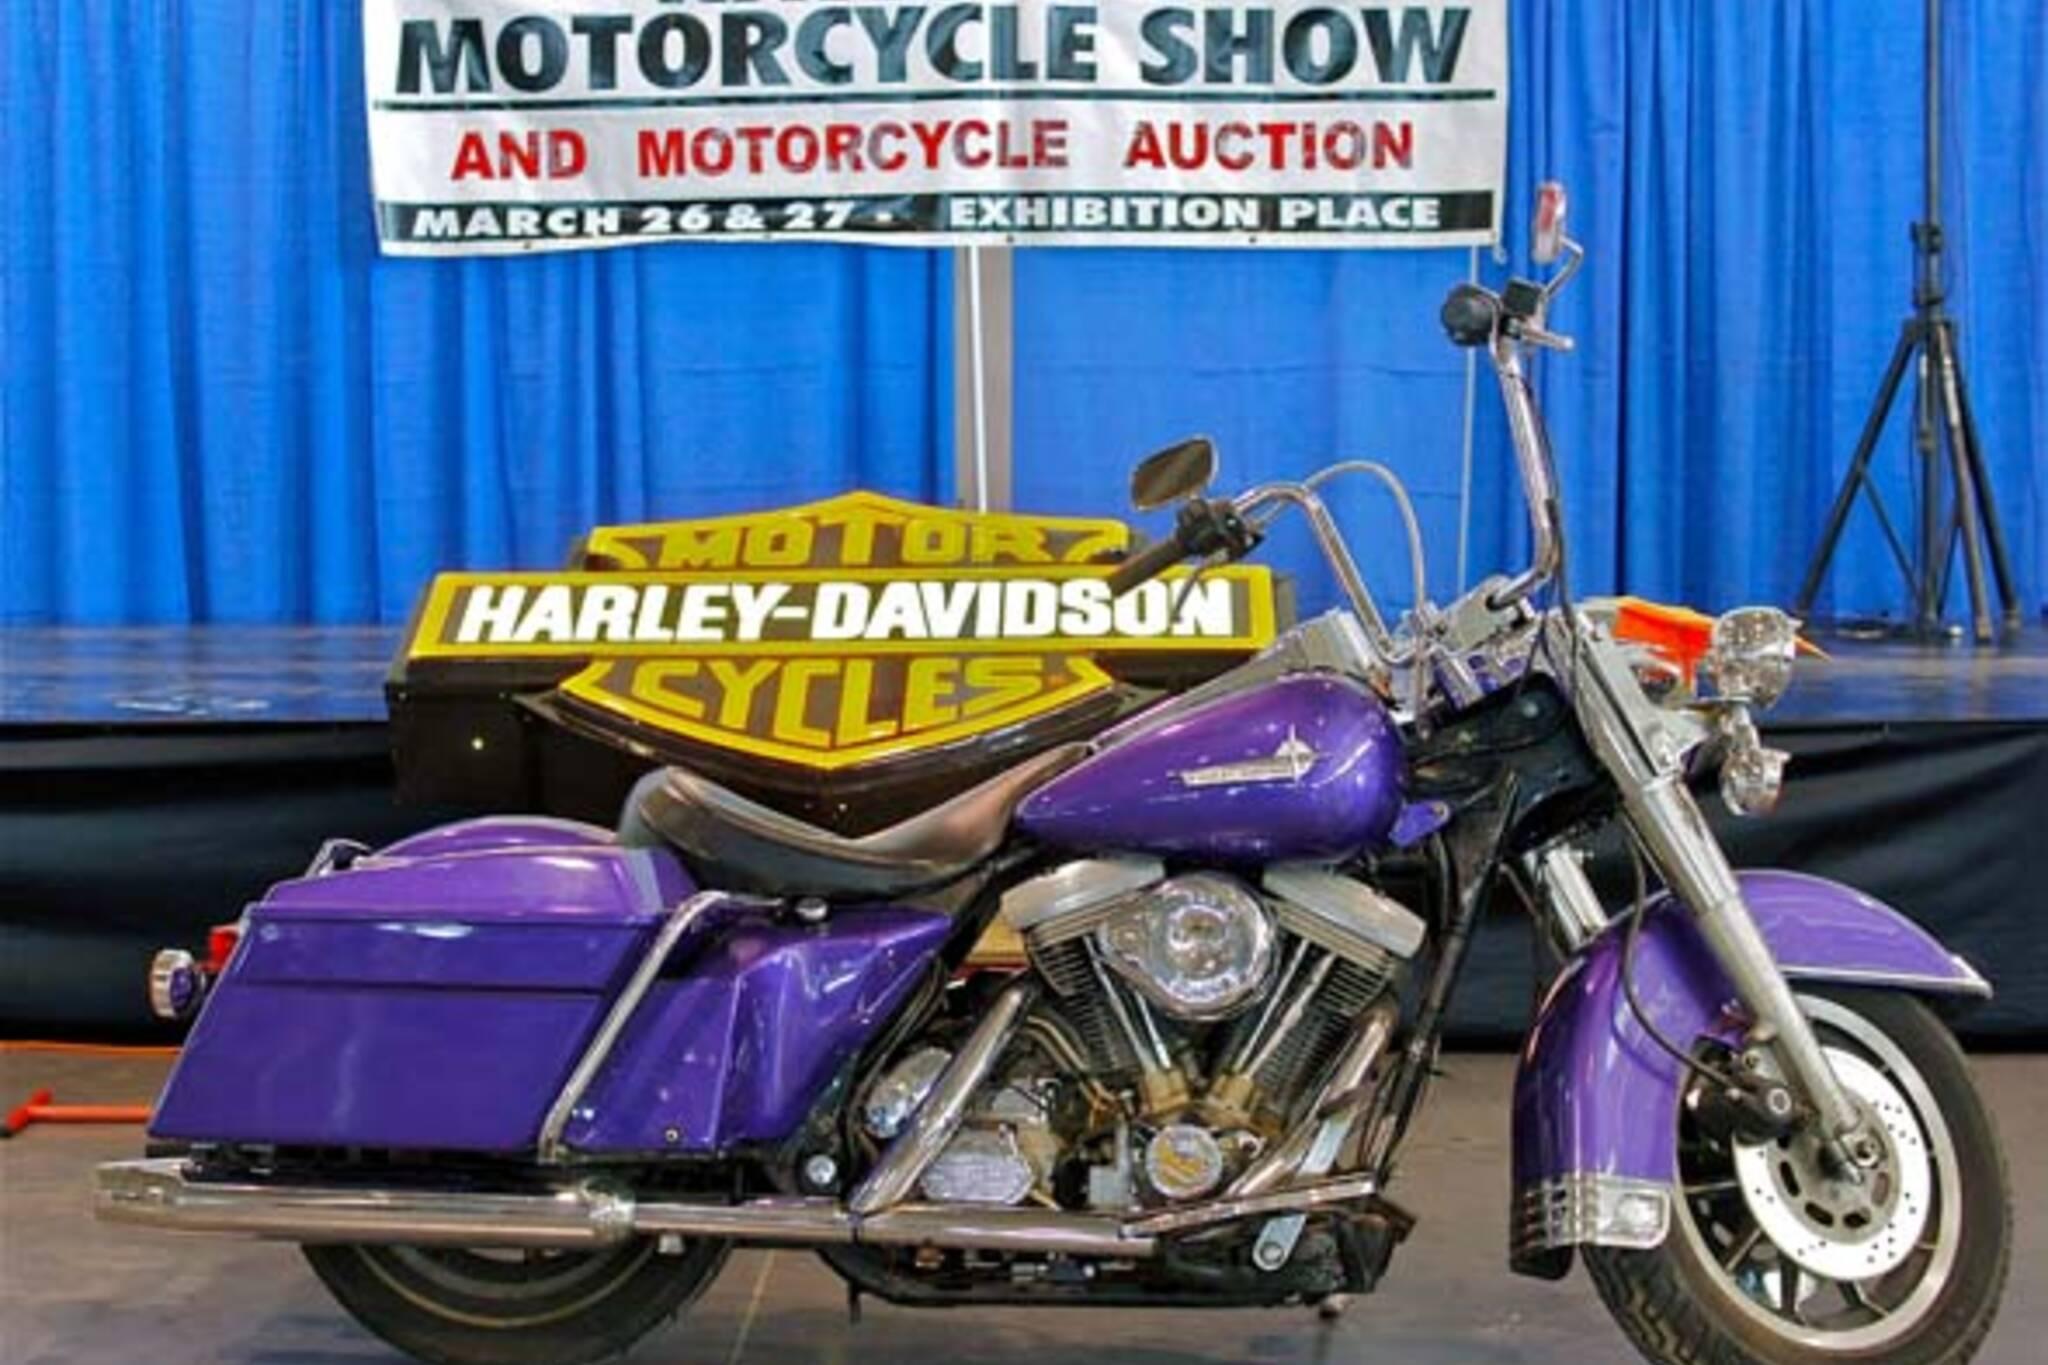 20110327_MotorcycleShow9.jpg